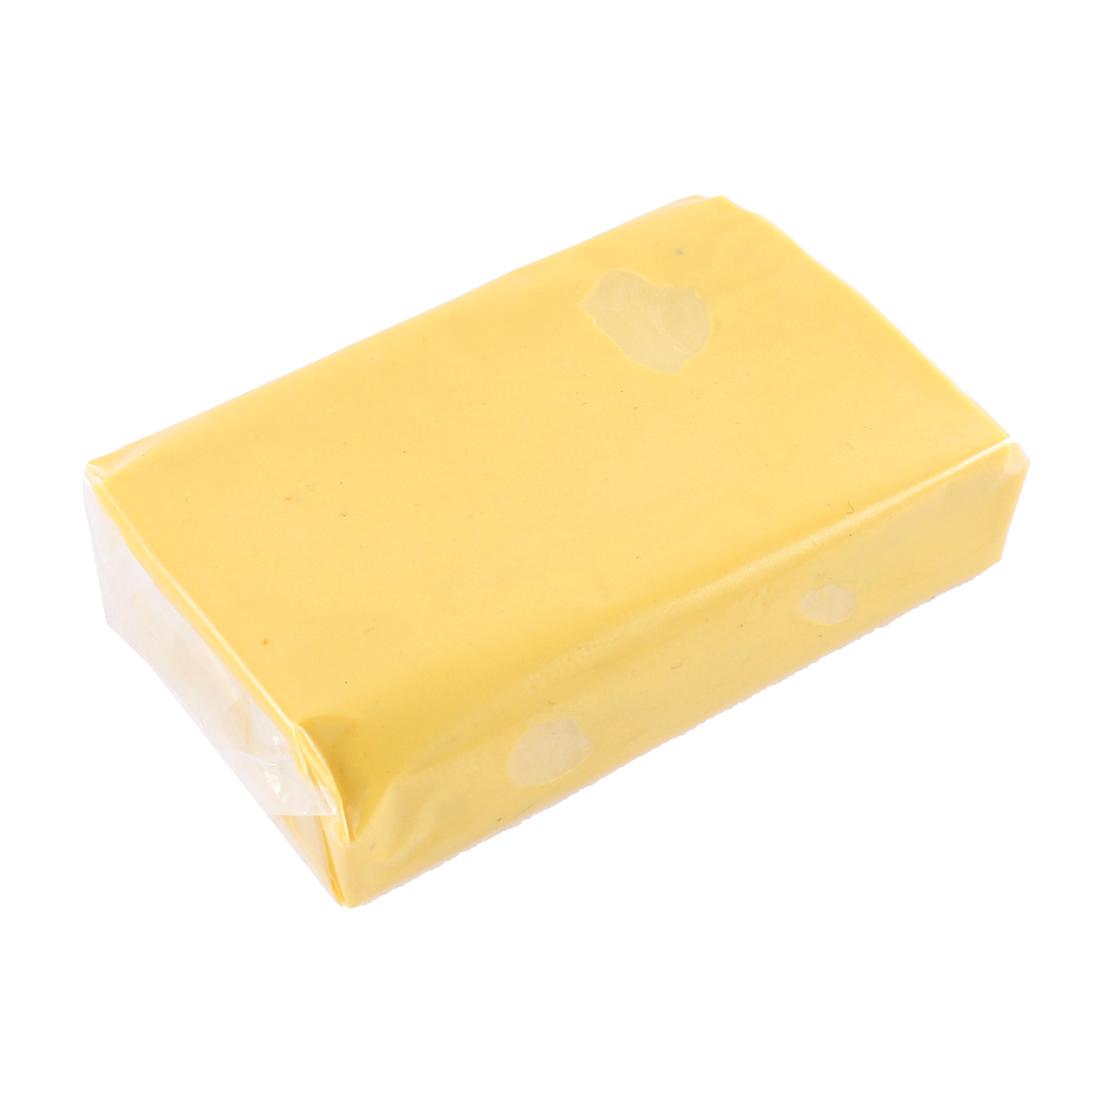 Car Magic Clay Bar Polishing Clays 148g Auto Detailing Magic Claybar Yellow New